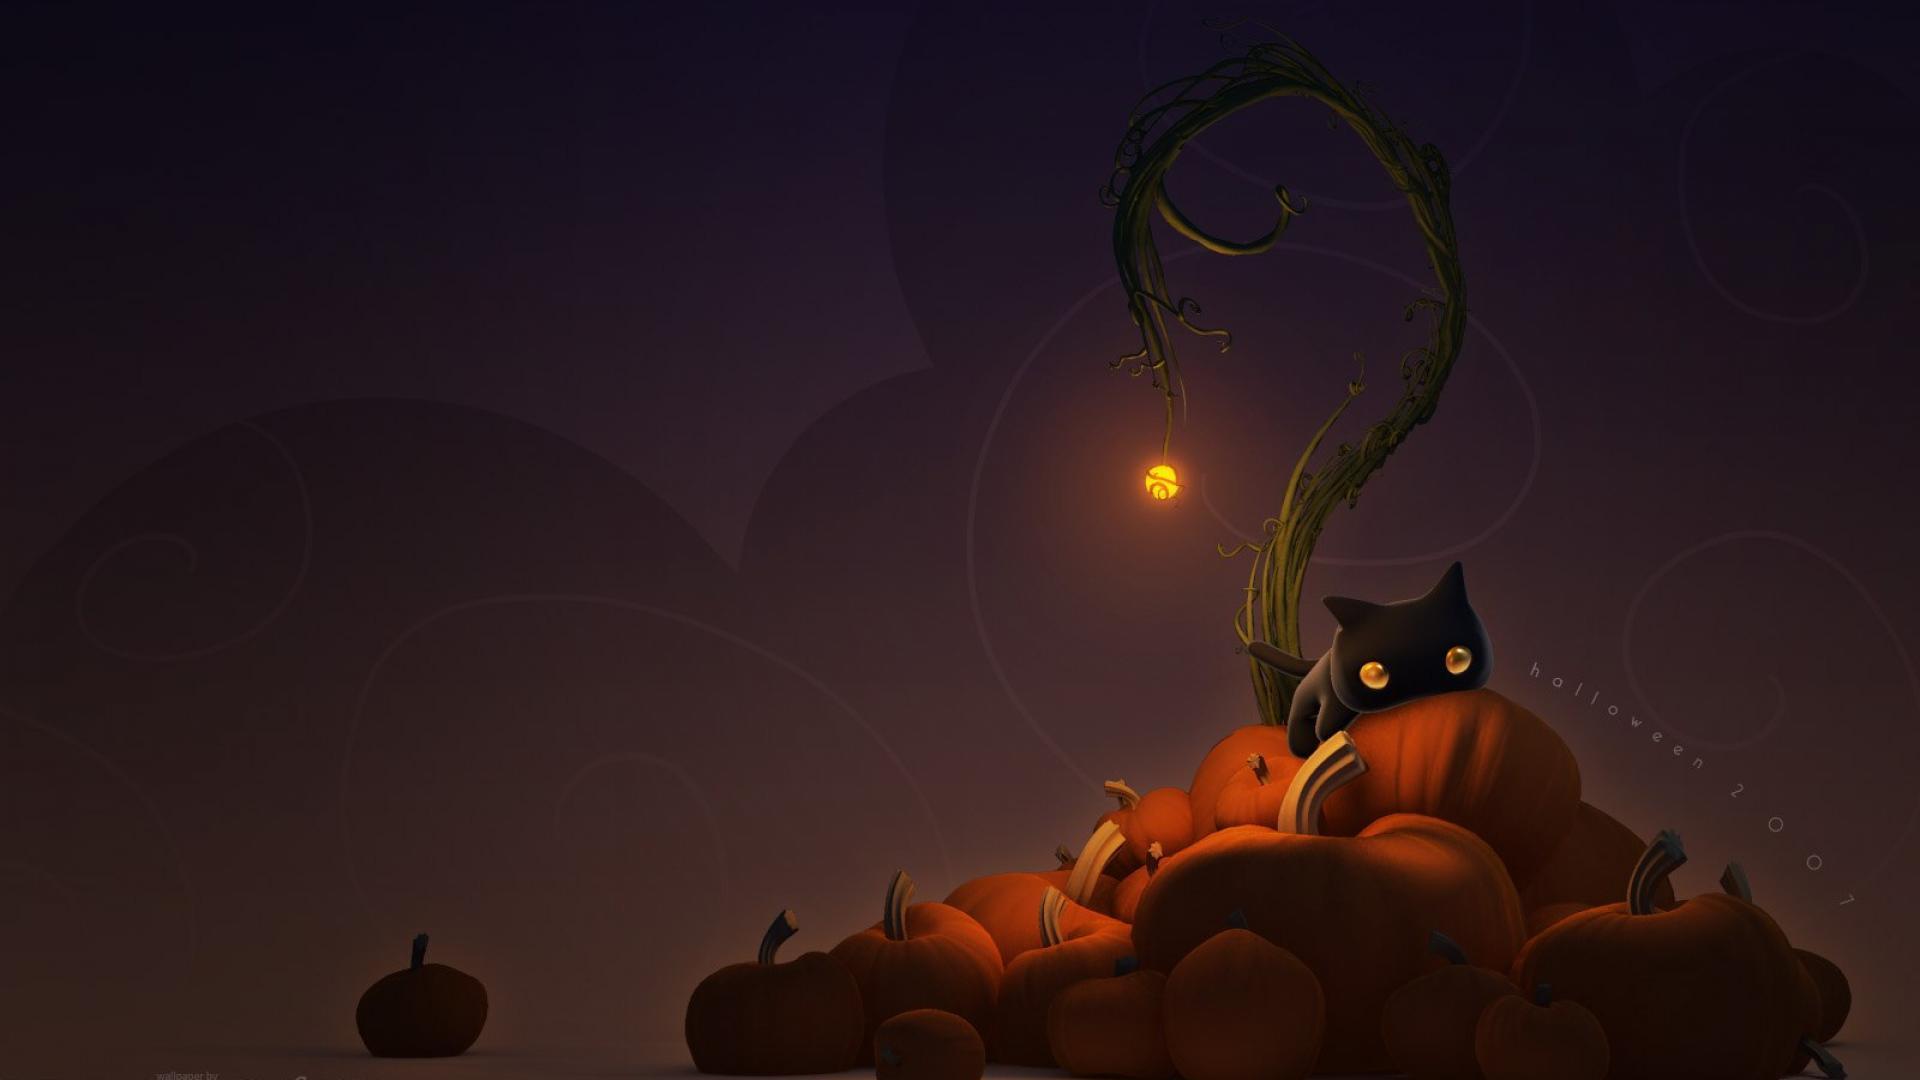 Halloween Cat Wallpapers Top Free Halloween Cat Backgrounds Wallpaperaccess